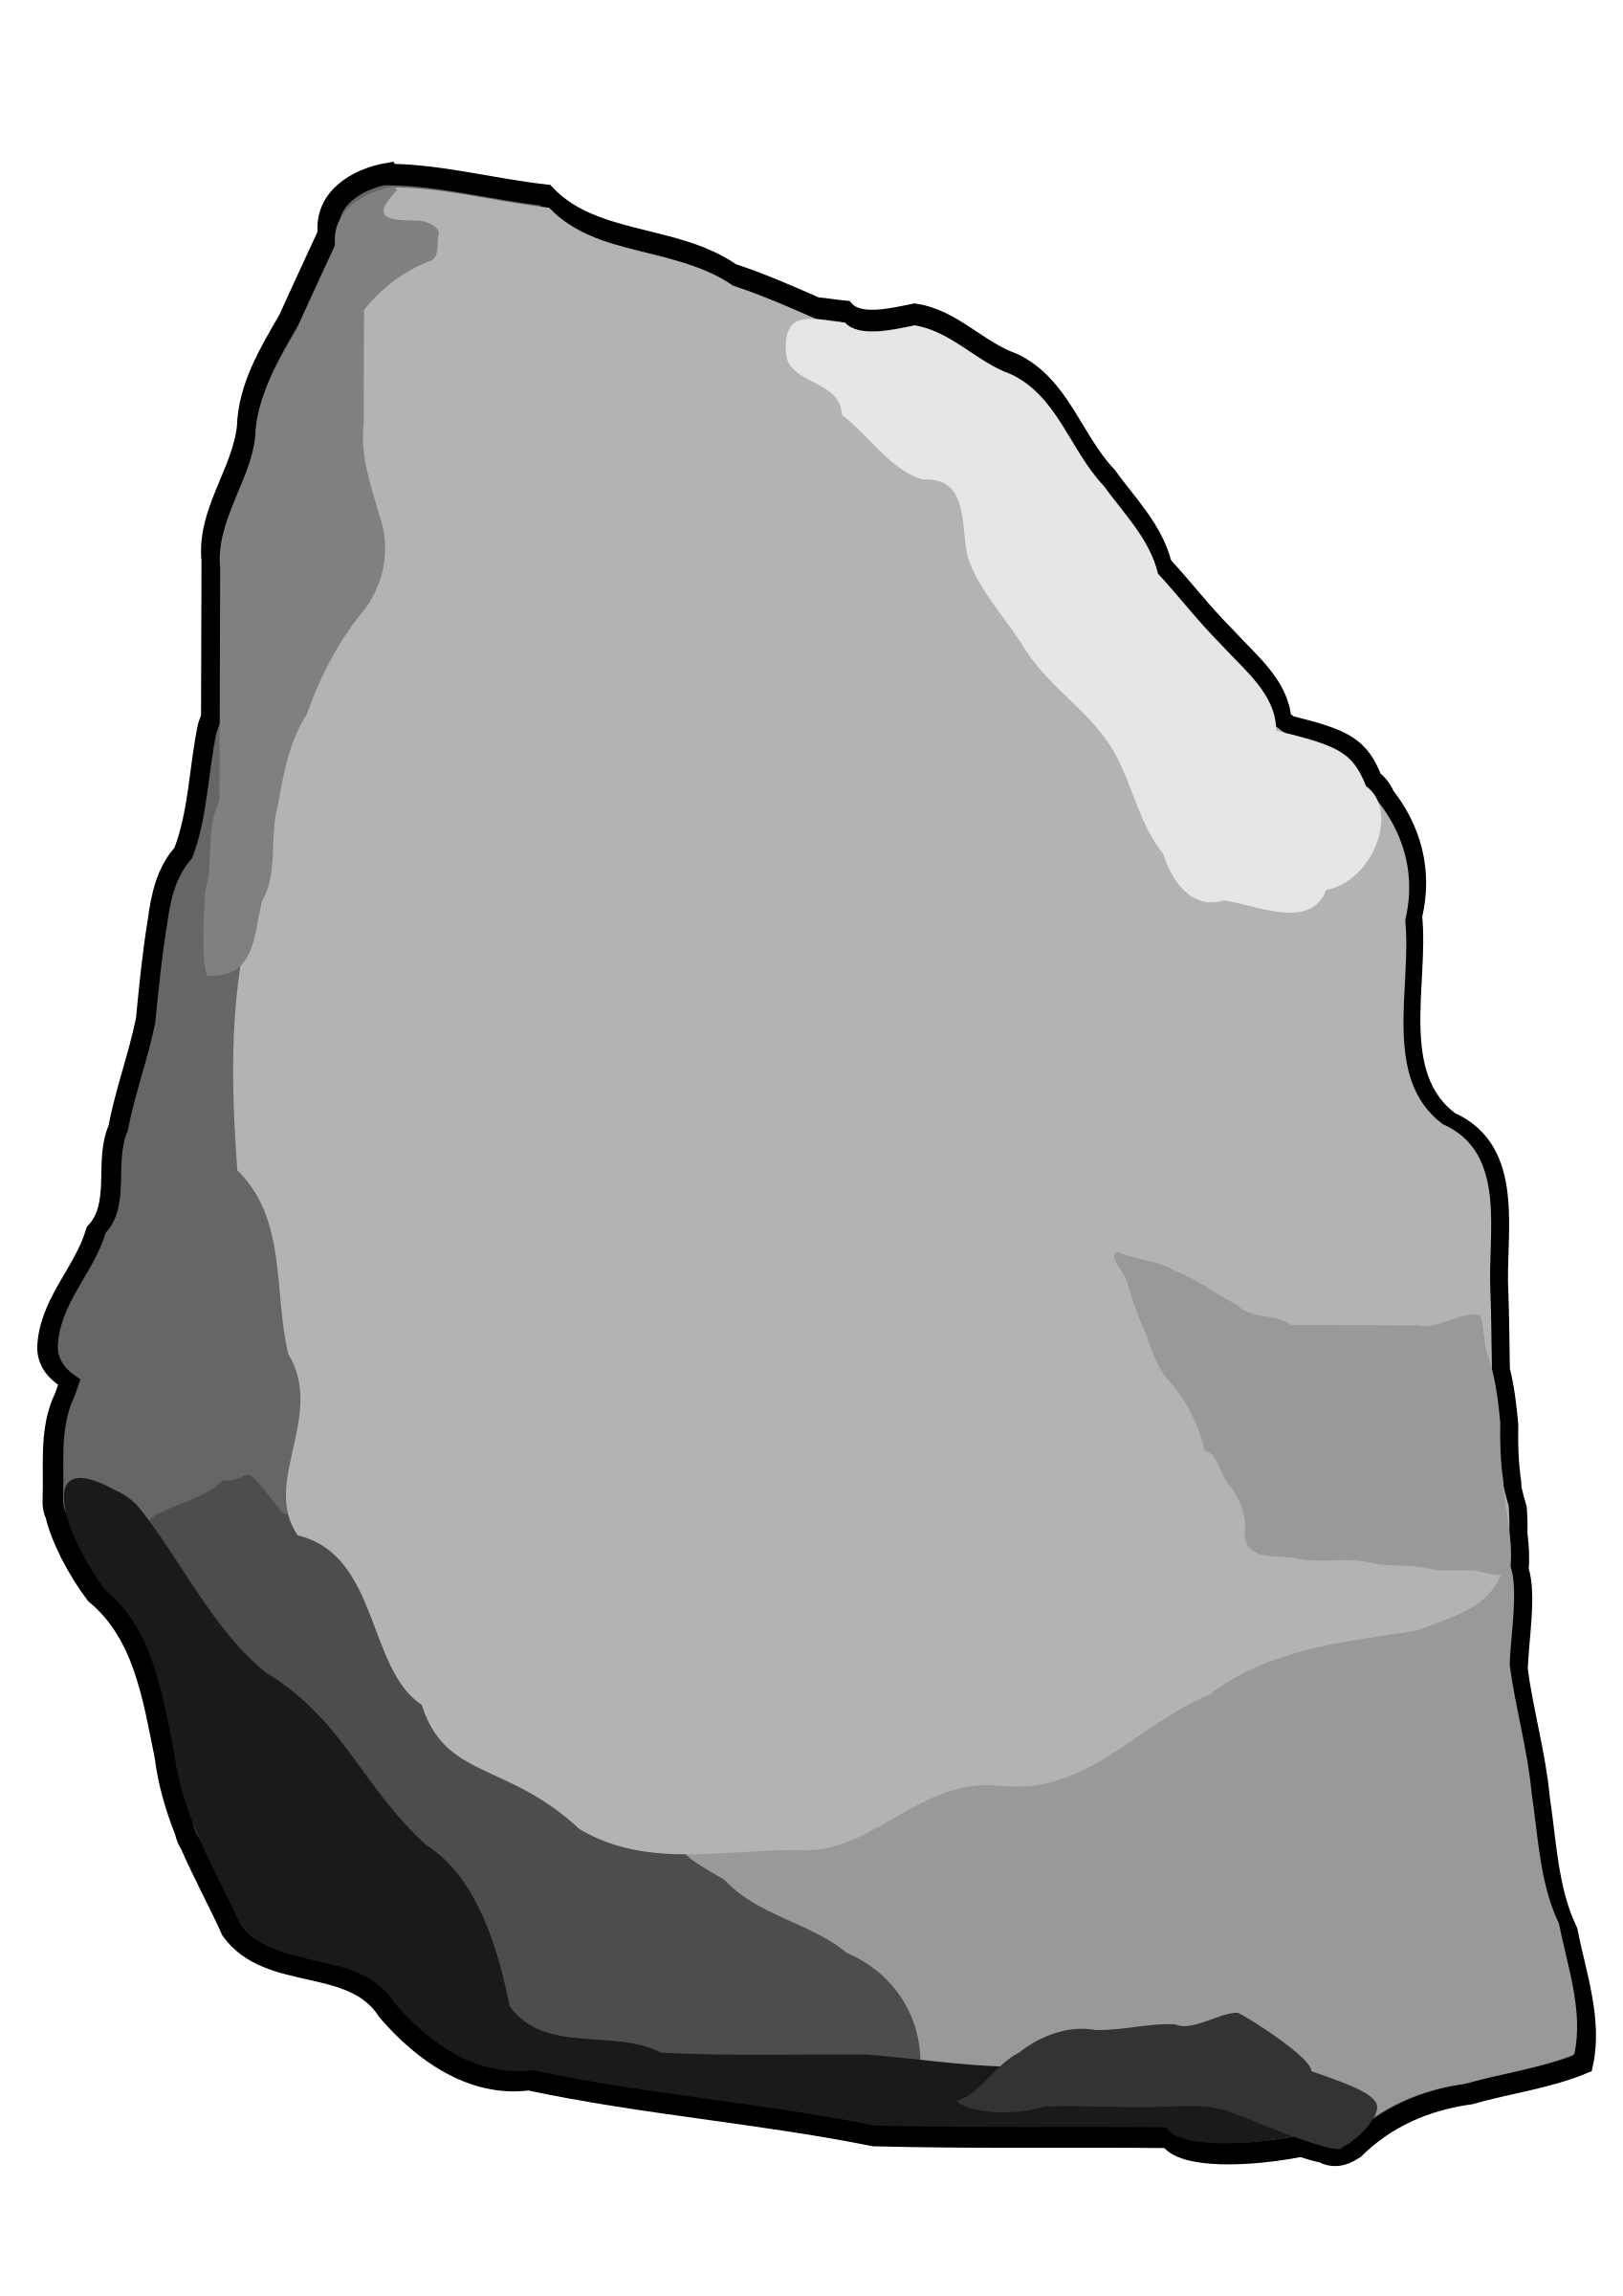 grey stone rock vector clipart image free stock photo public rh goodfreephotos com rock clipart desert stone free clipart of rocks